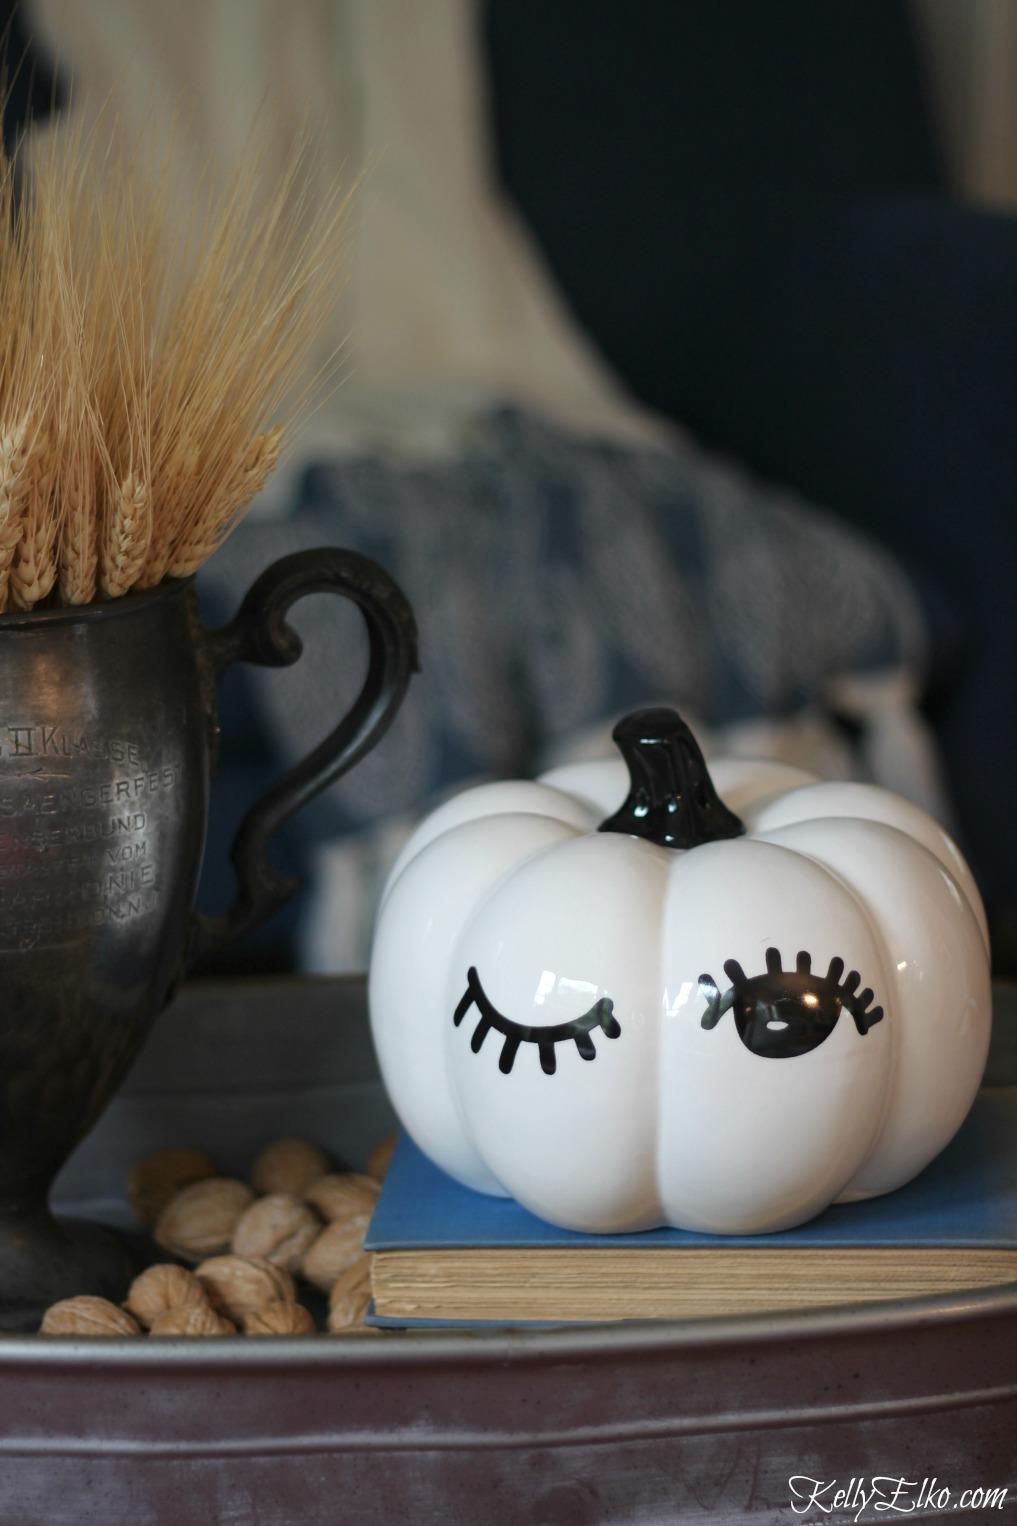 Love this winking pumpkin kellyelko.com